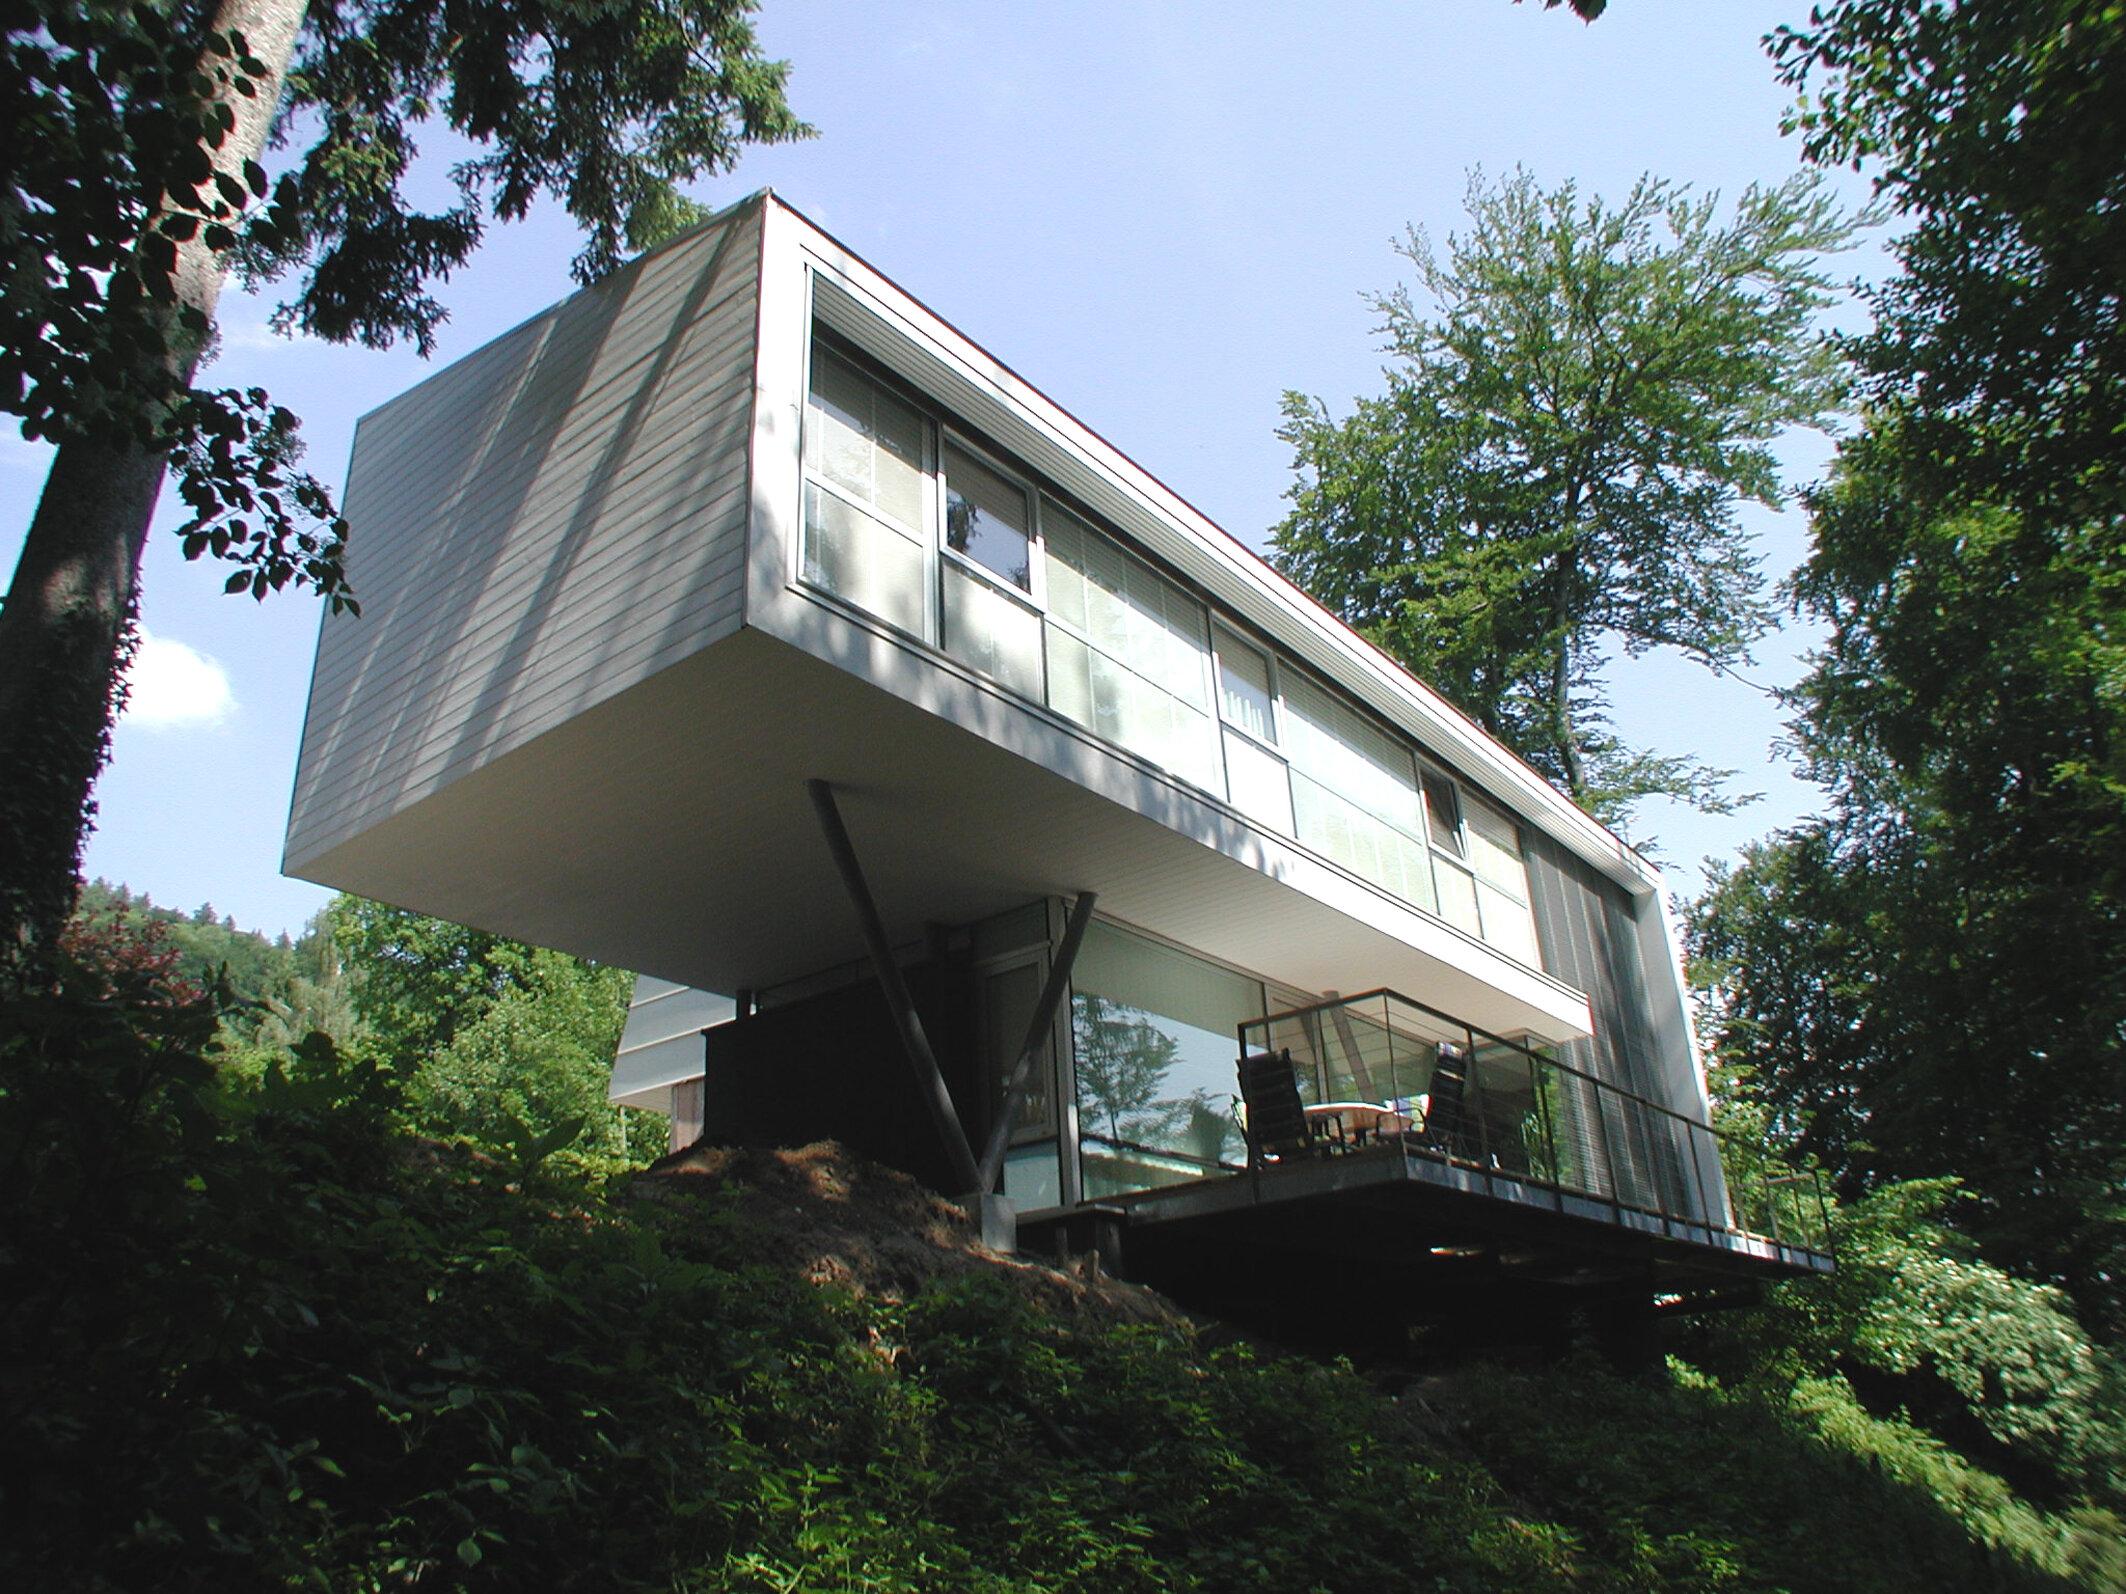 Showcase for sensible design - Feature in the book Salzburg besser bauen